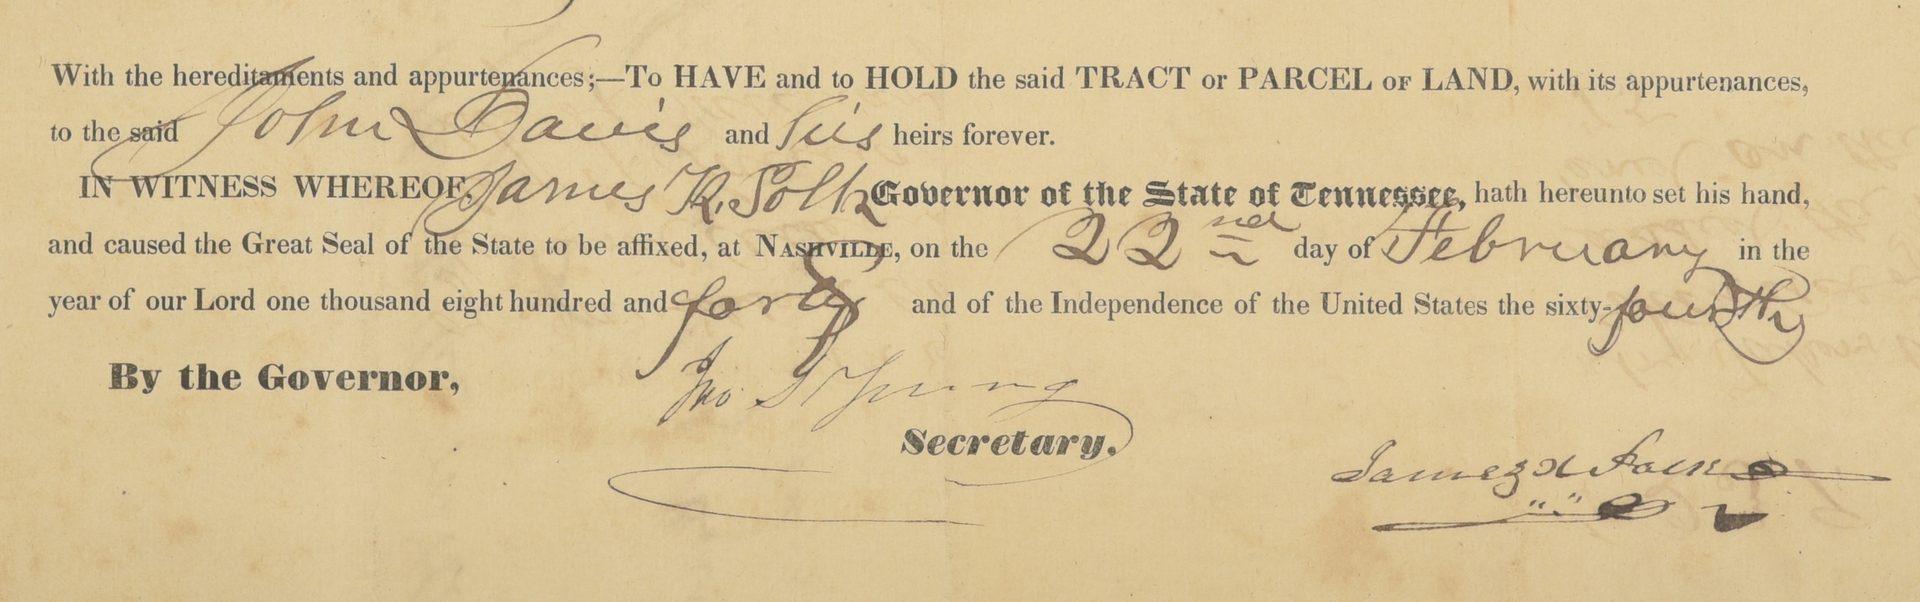 Lot 225: Gov. James K. Polk Signed Land Grant, Feb. 1840